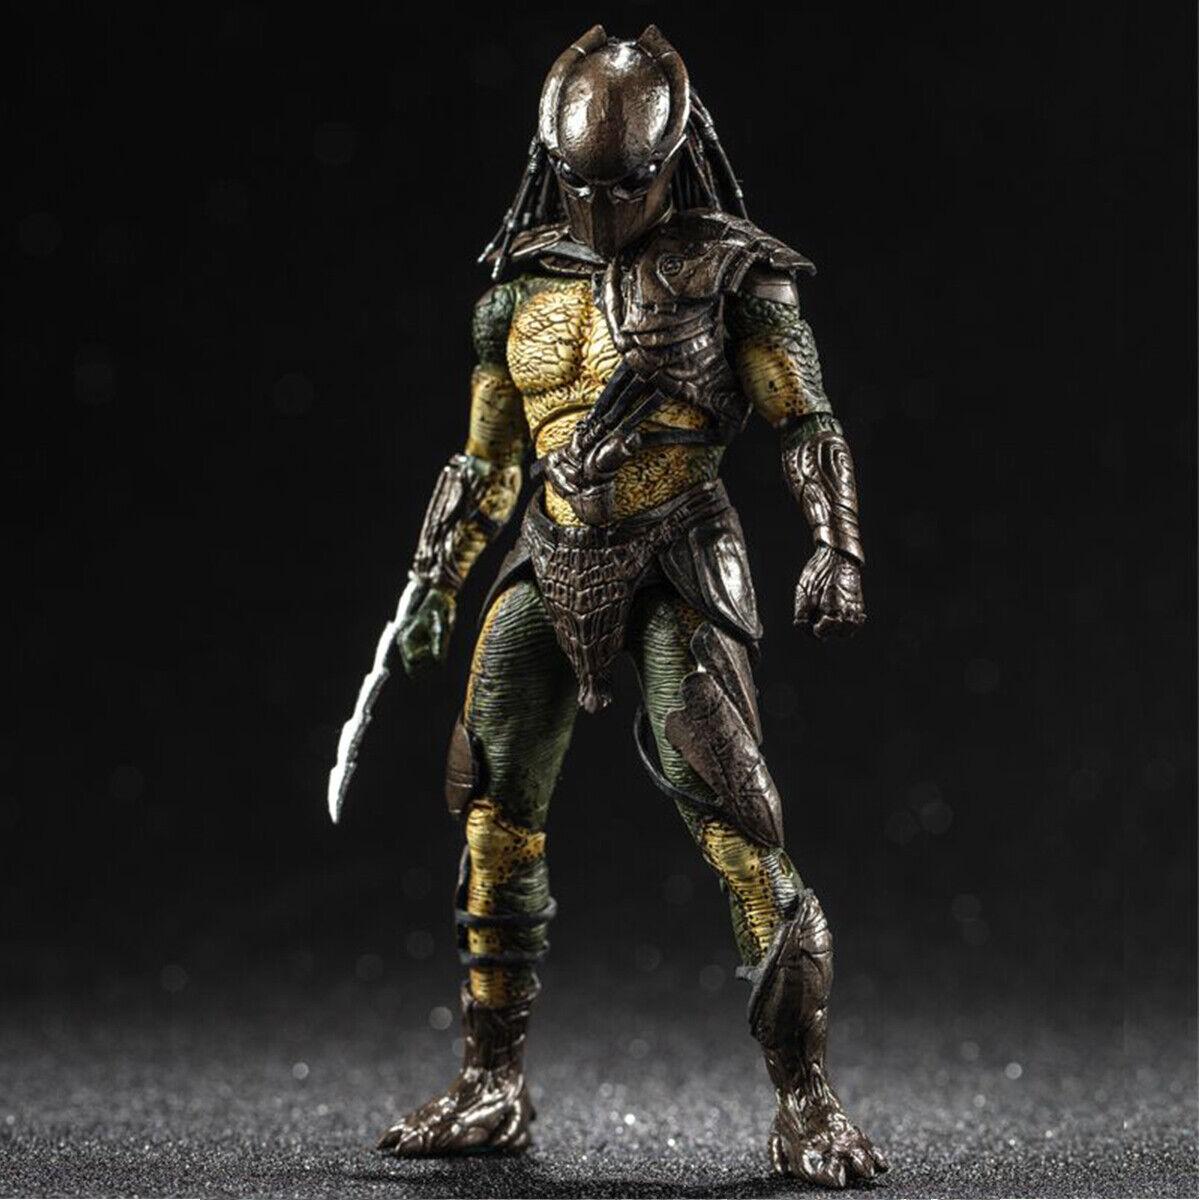 HiYa Toys Falconer Predator 1//18th Soldier Action Mini Figure Toys LD0051 Gifts